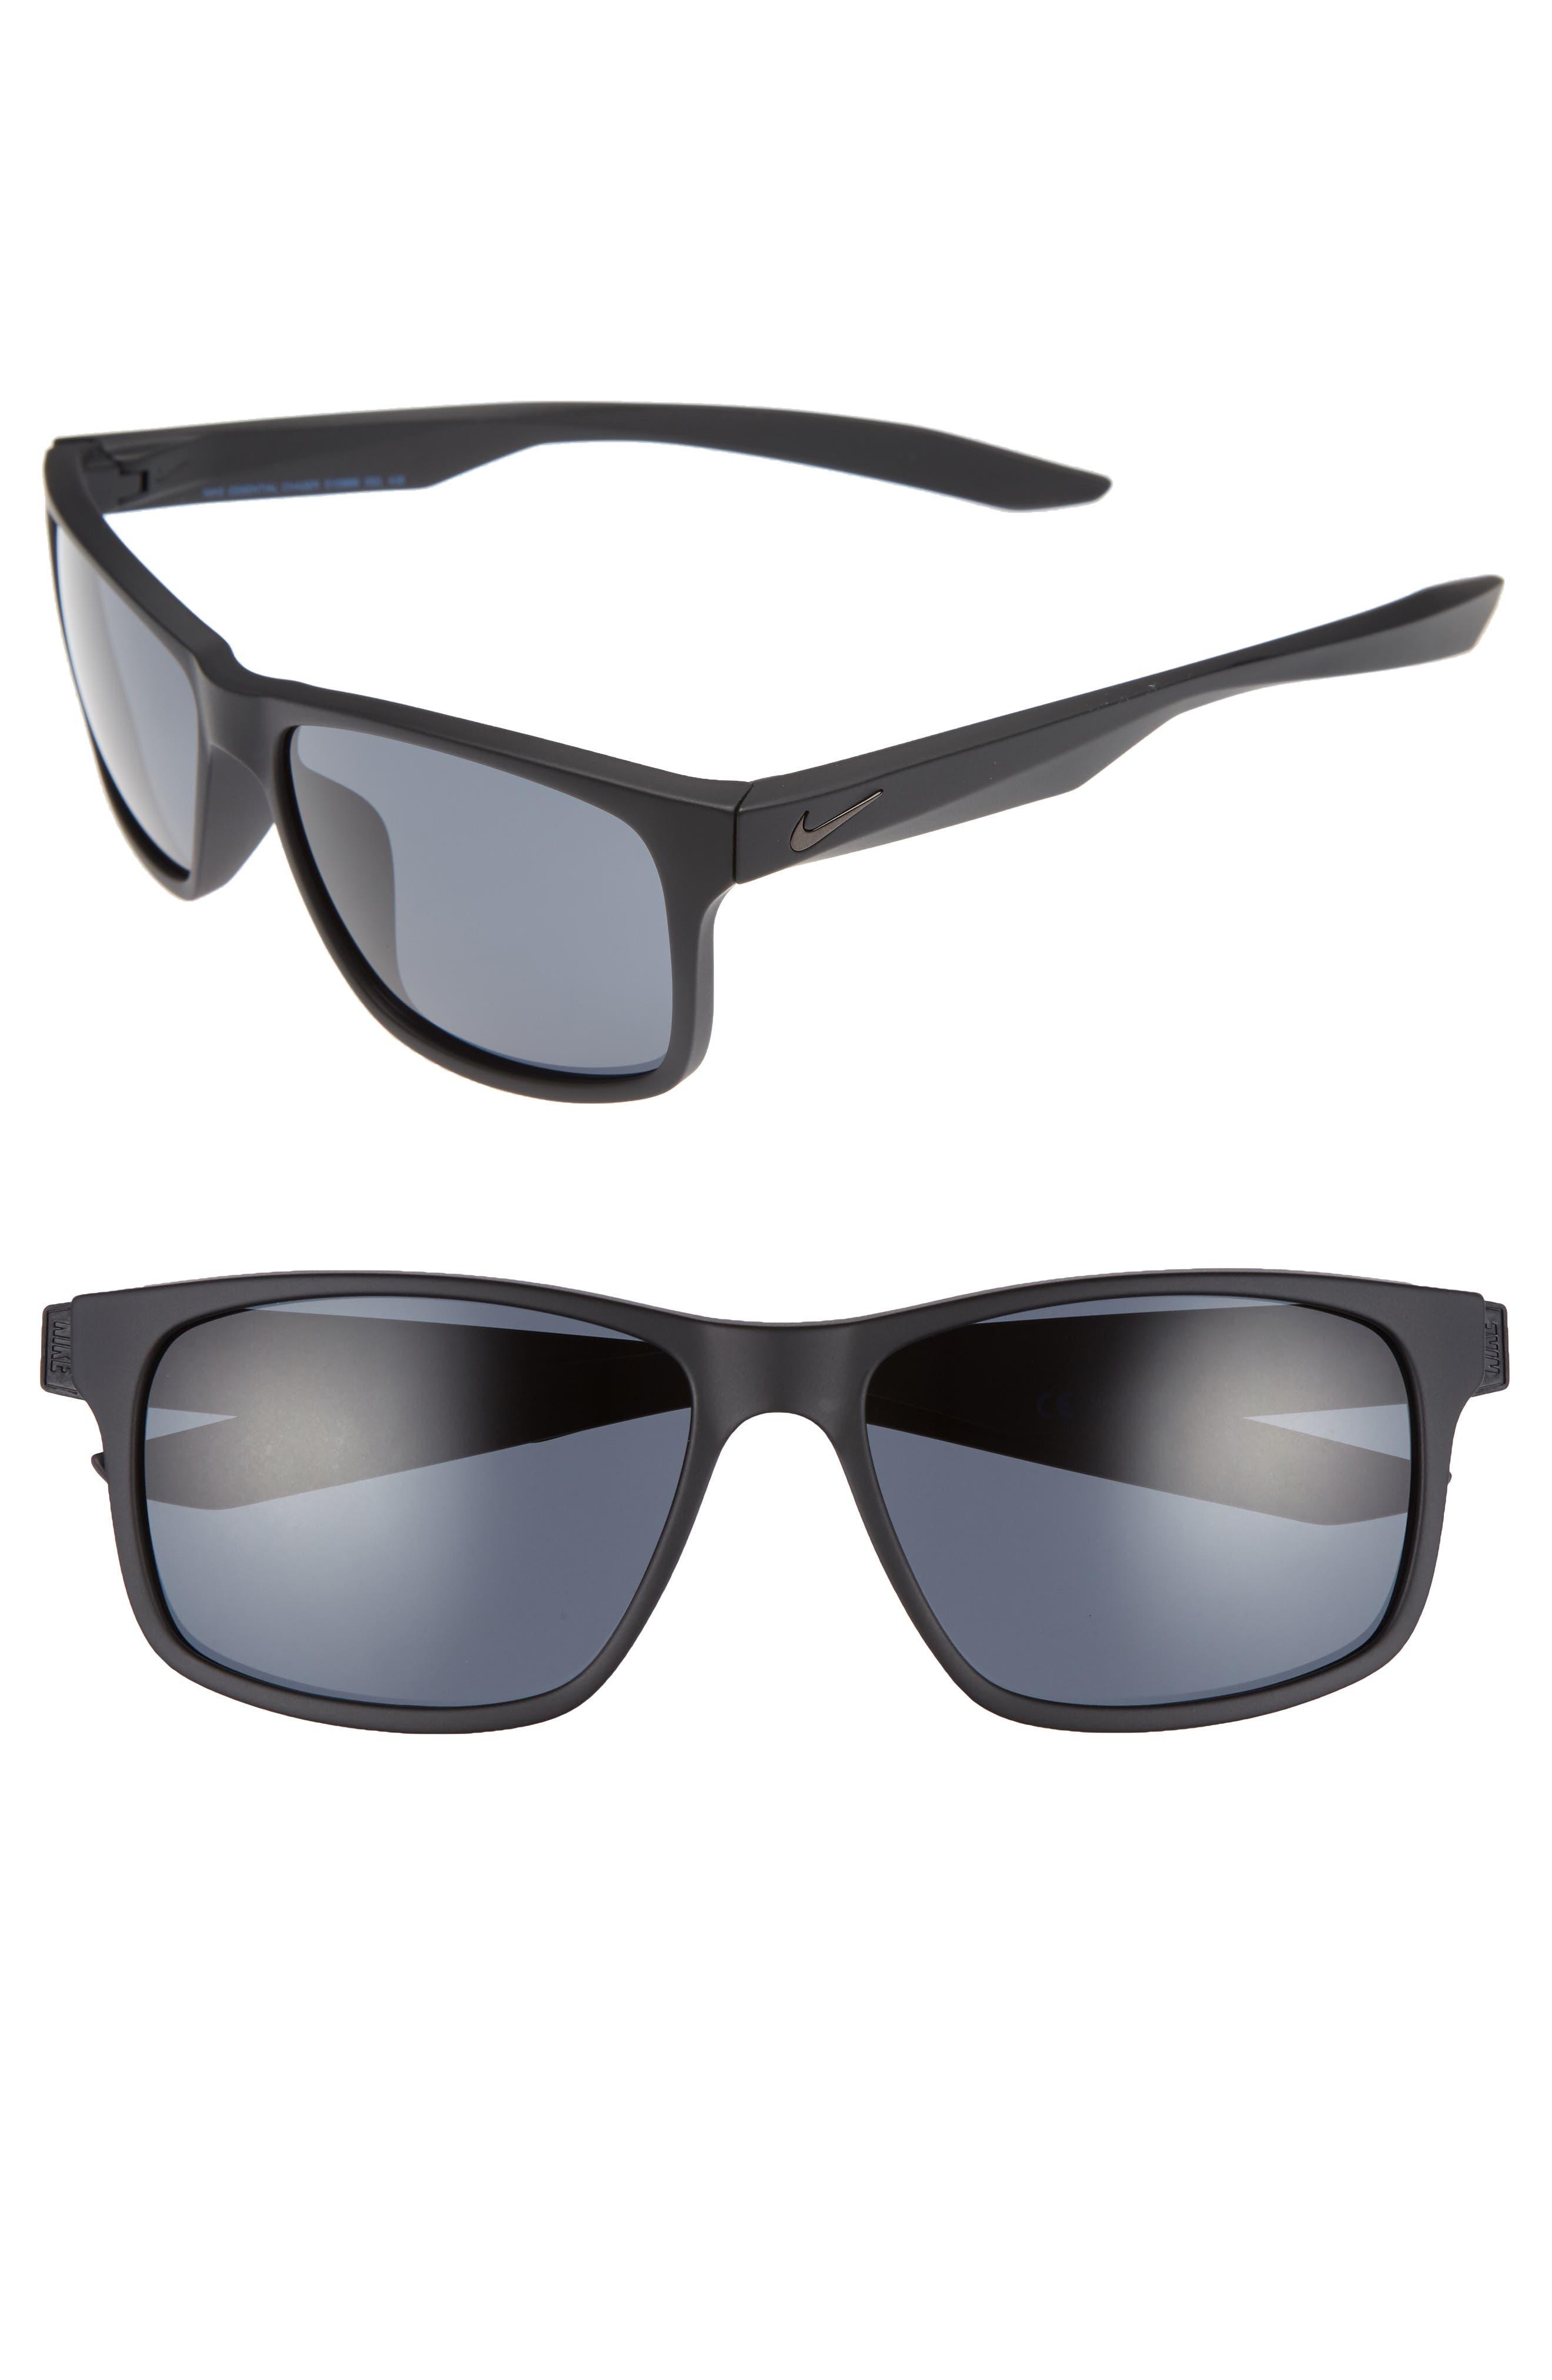 Essential Chaser 56mm Sunglasses,                         Main,                         color, MATTE BLACK/ RACER BLUE